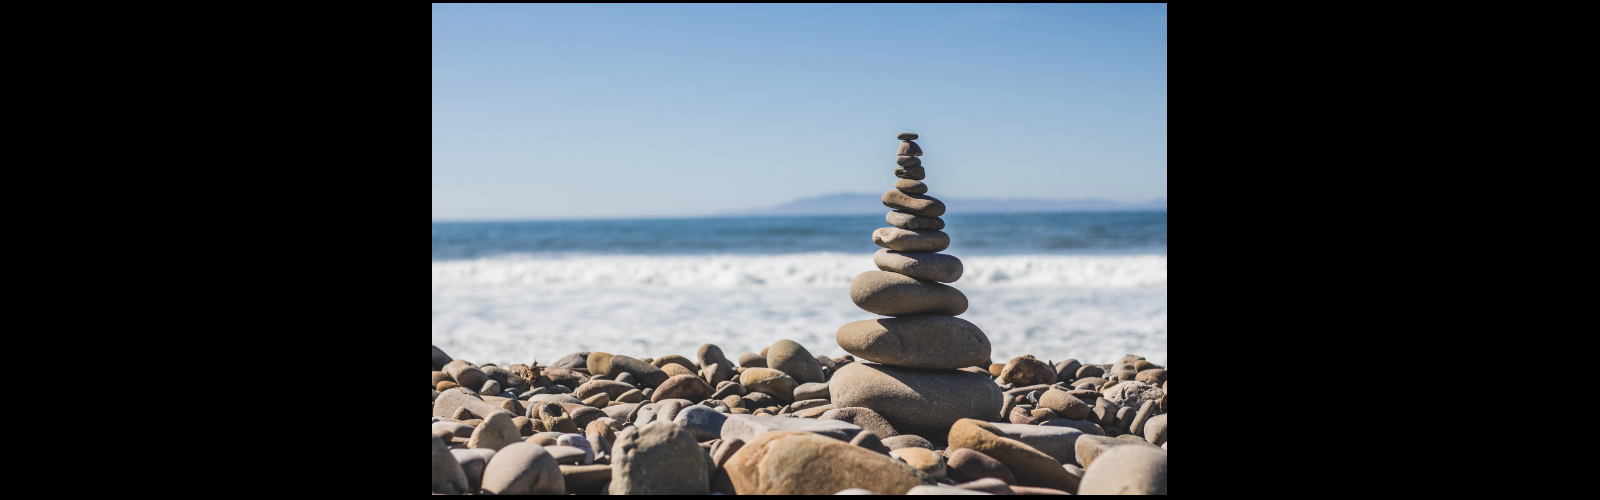 Mind - Meditation - Rocks Balanced in a Pile on the Beach